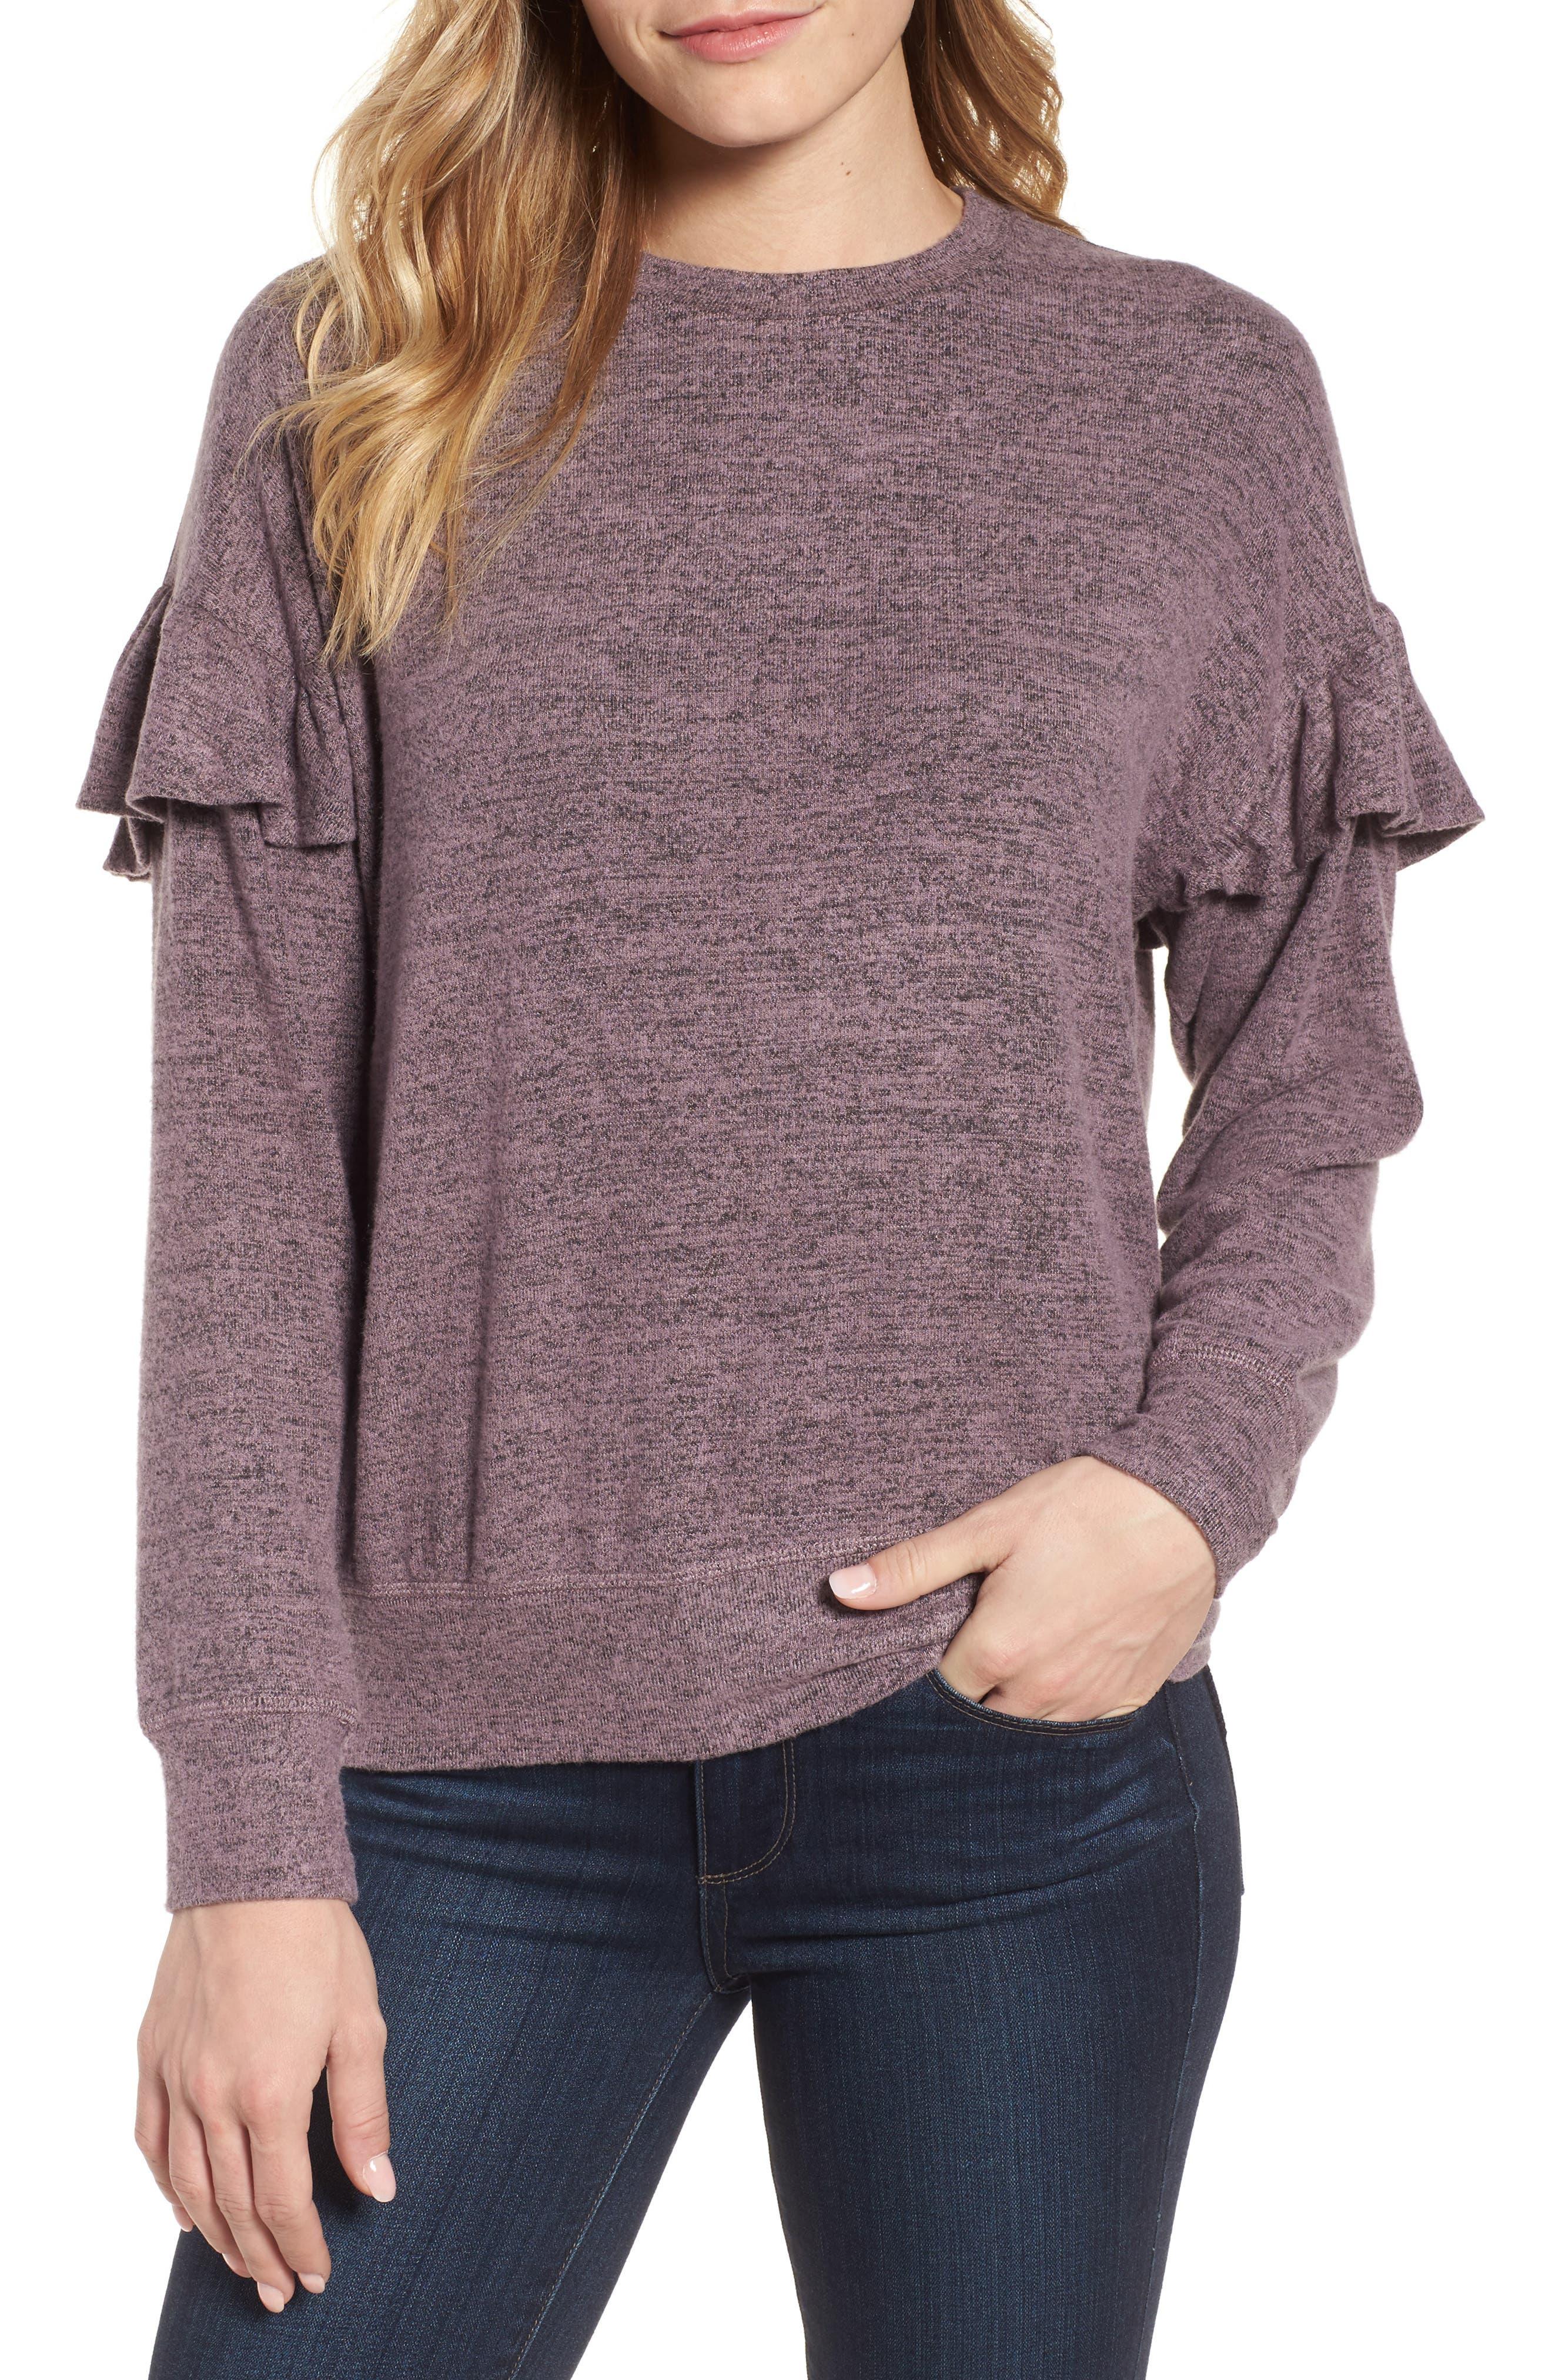 Bobeau Ruffle Sleeve Sweatshirt